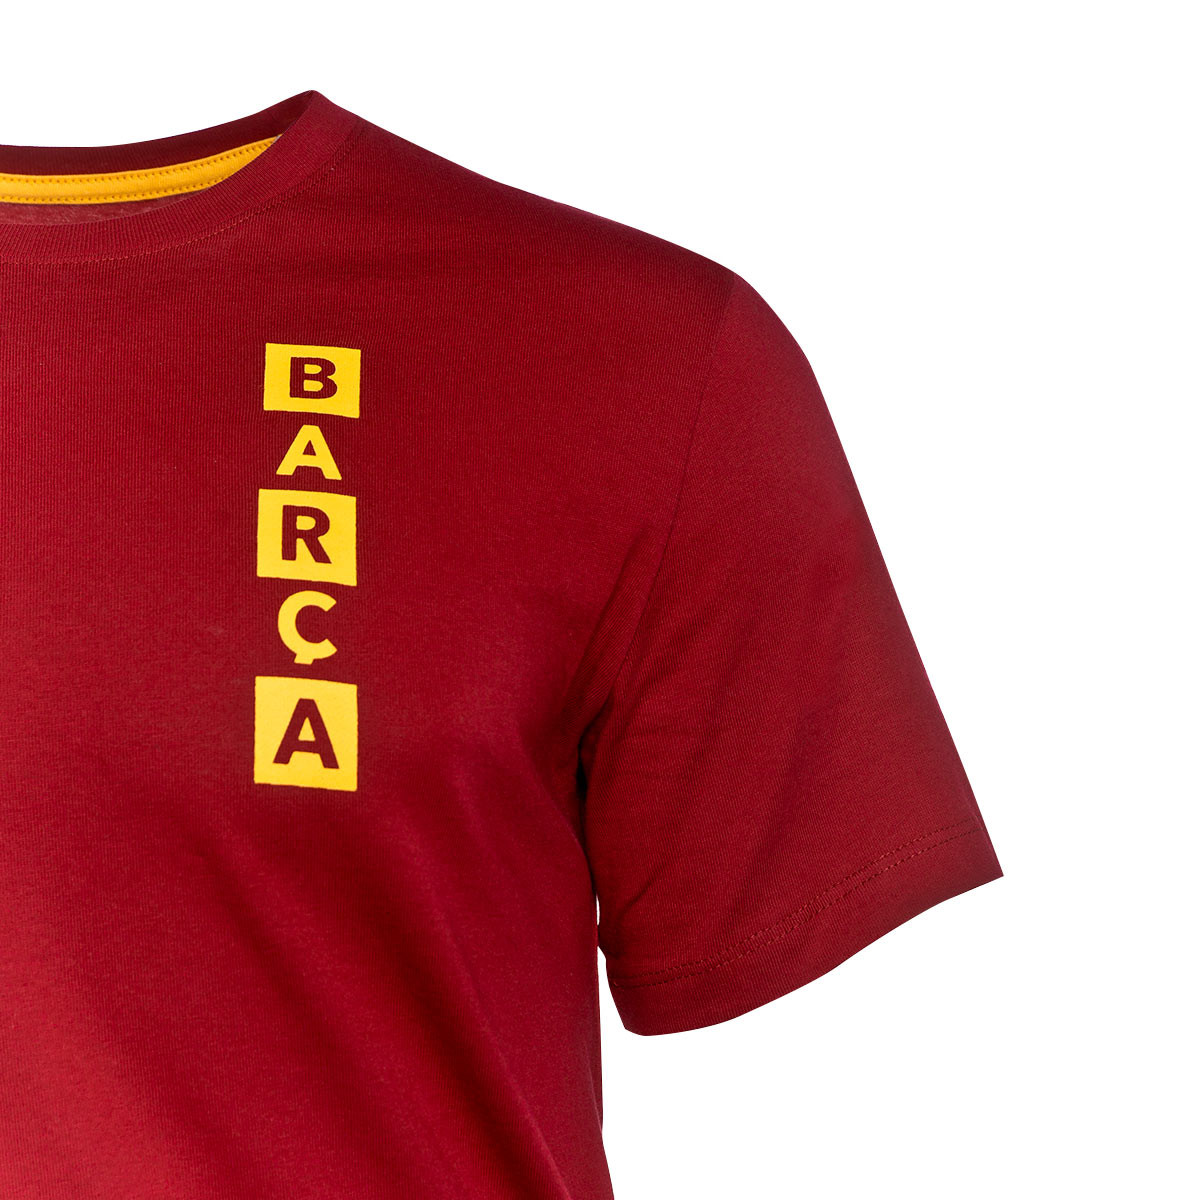 size 40 63f23 8b0e0 Camiseta FC Barcelona Kit Story Tell 2018-2019 Noble red